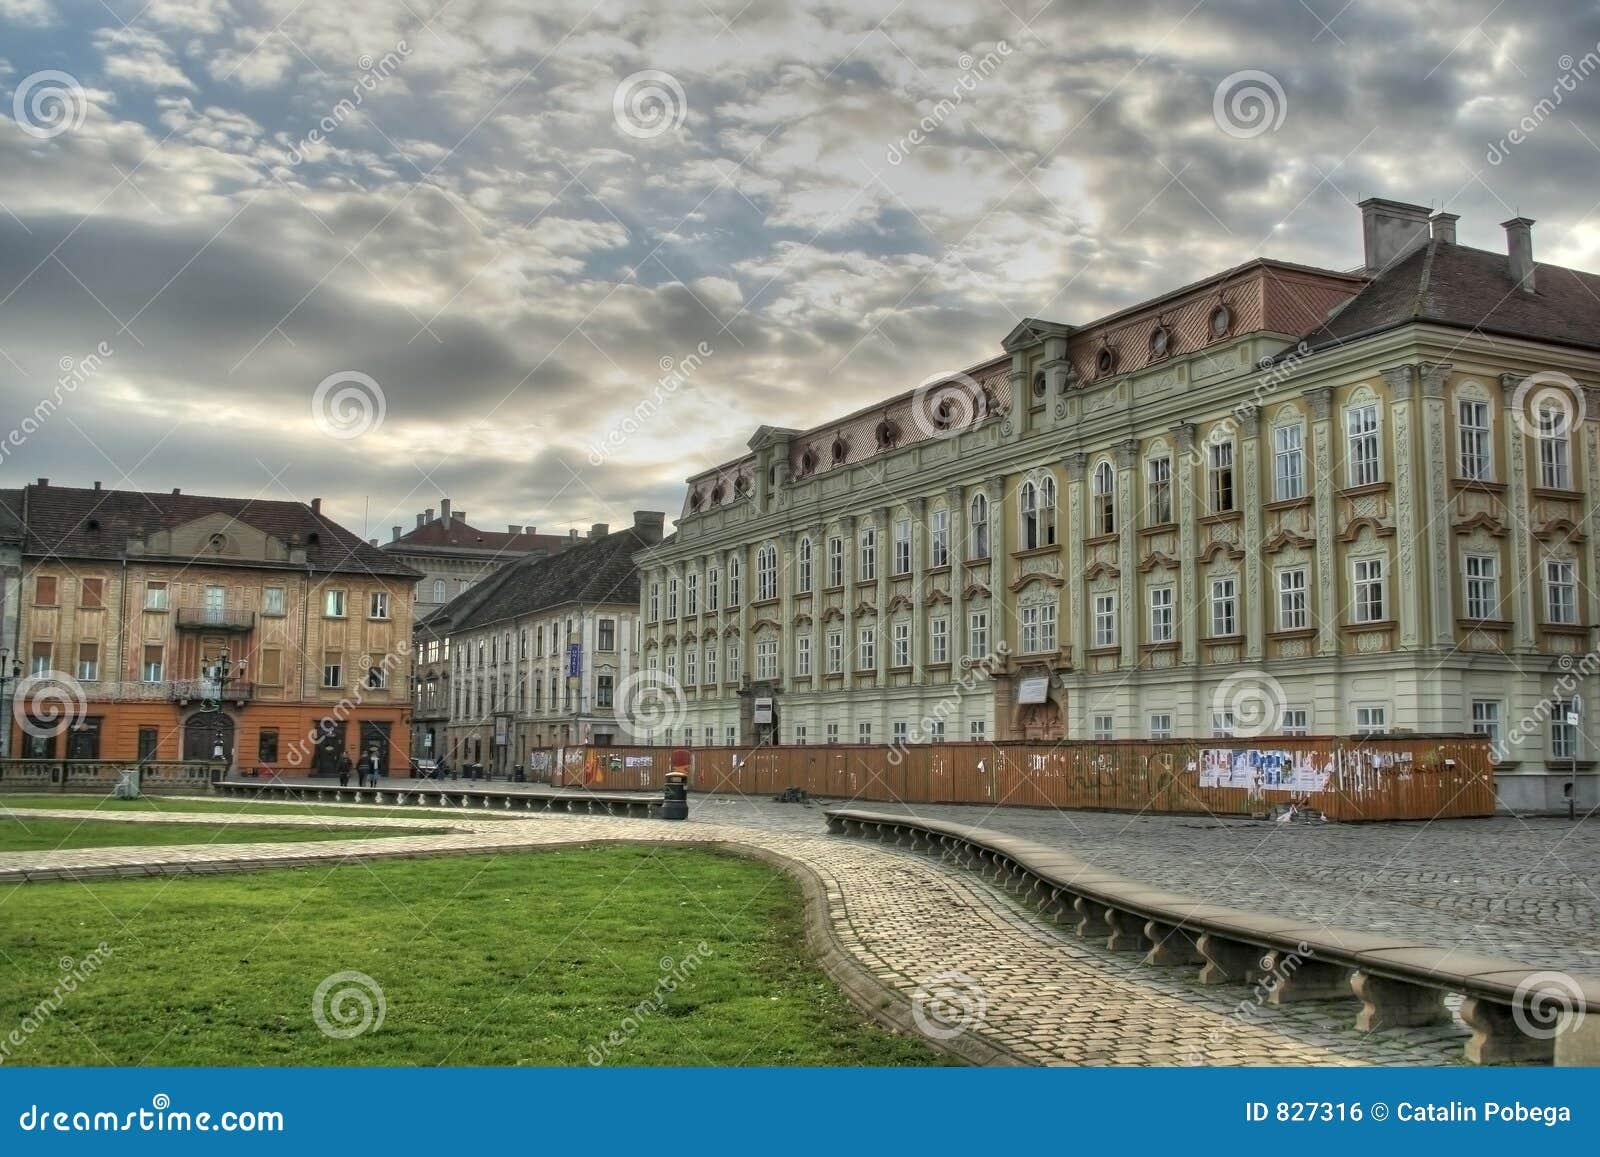 Architecture of Timisoara